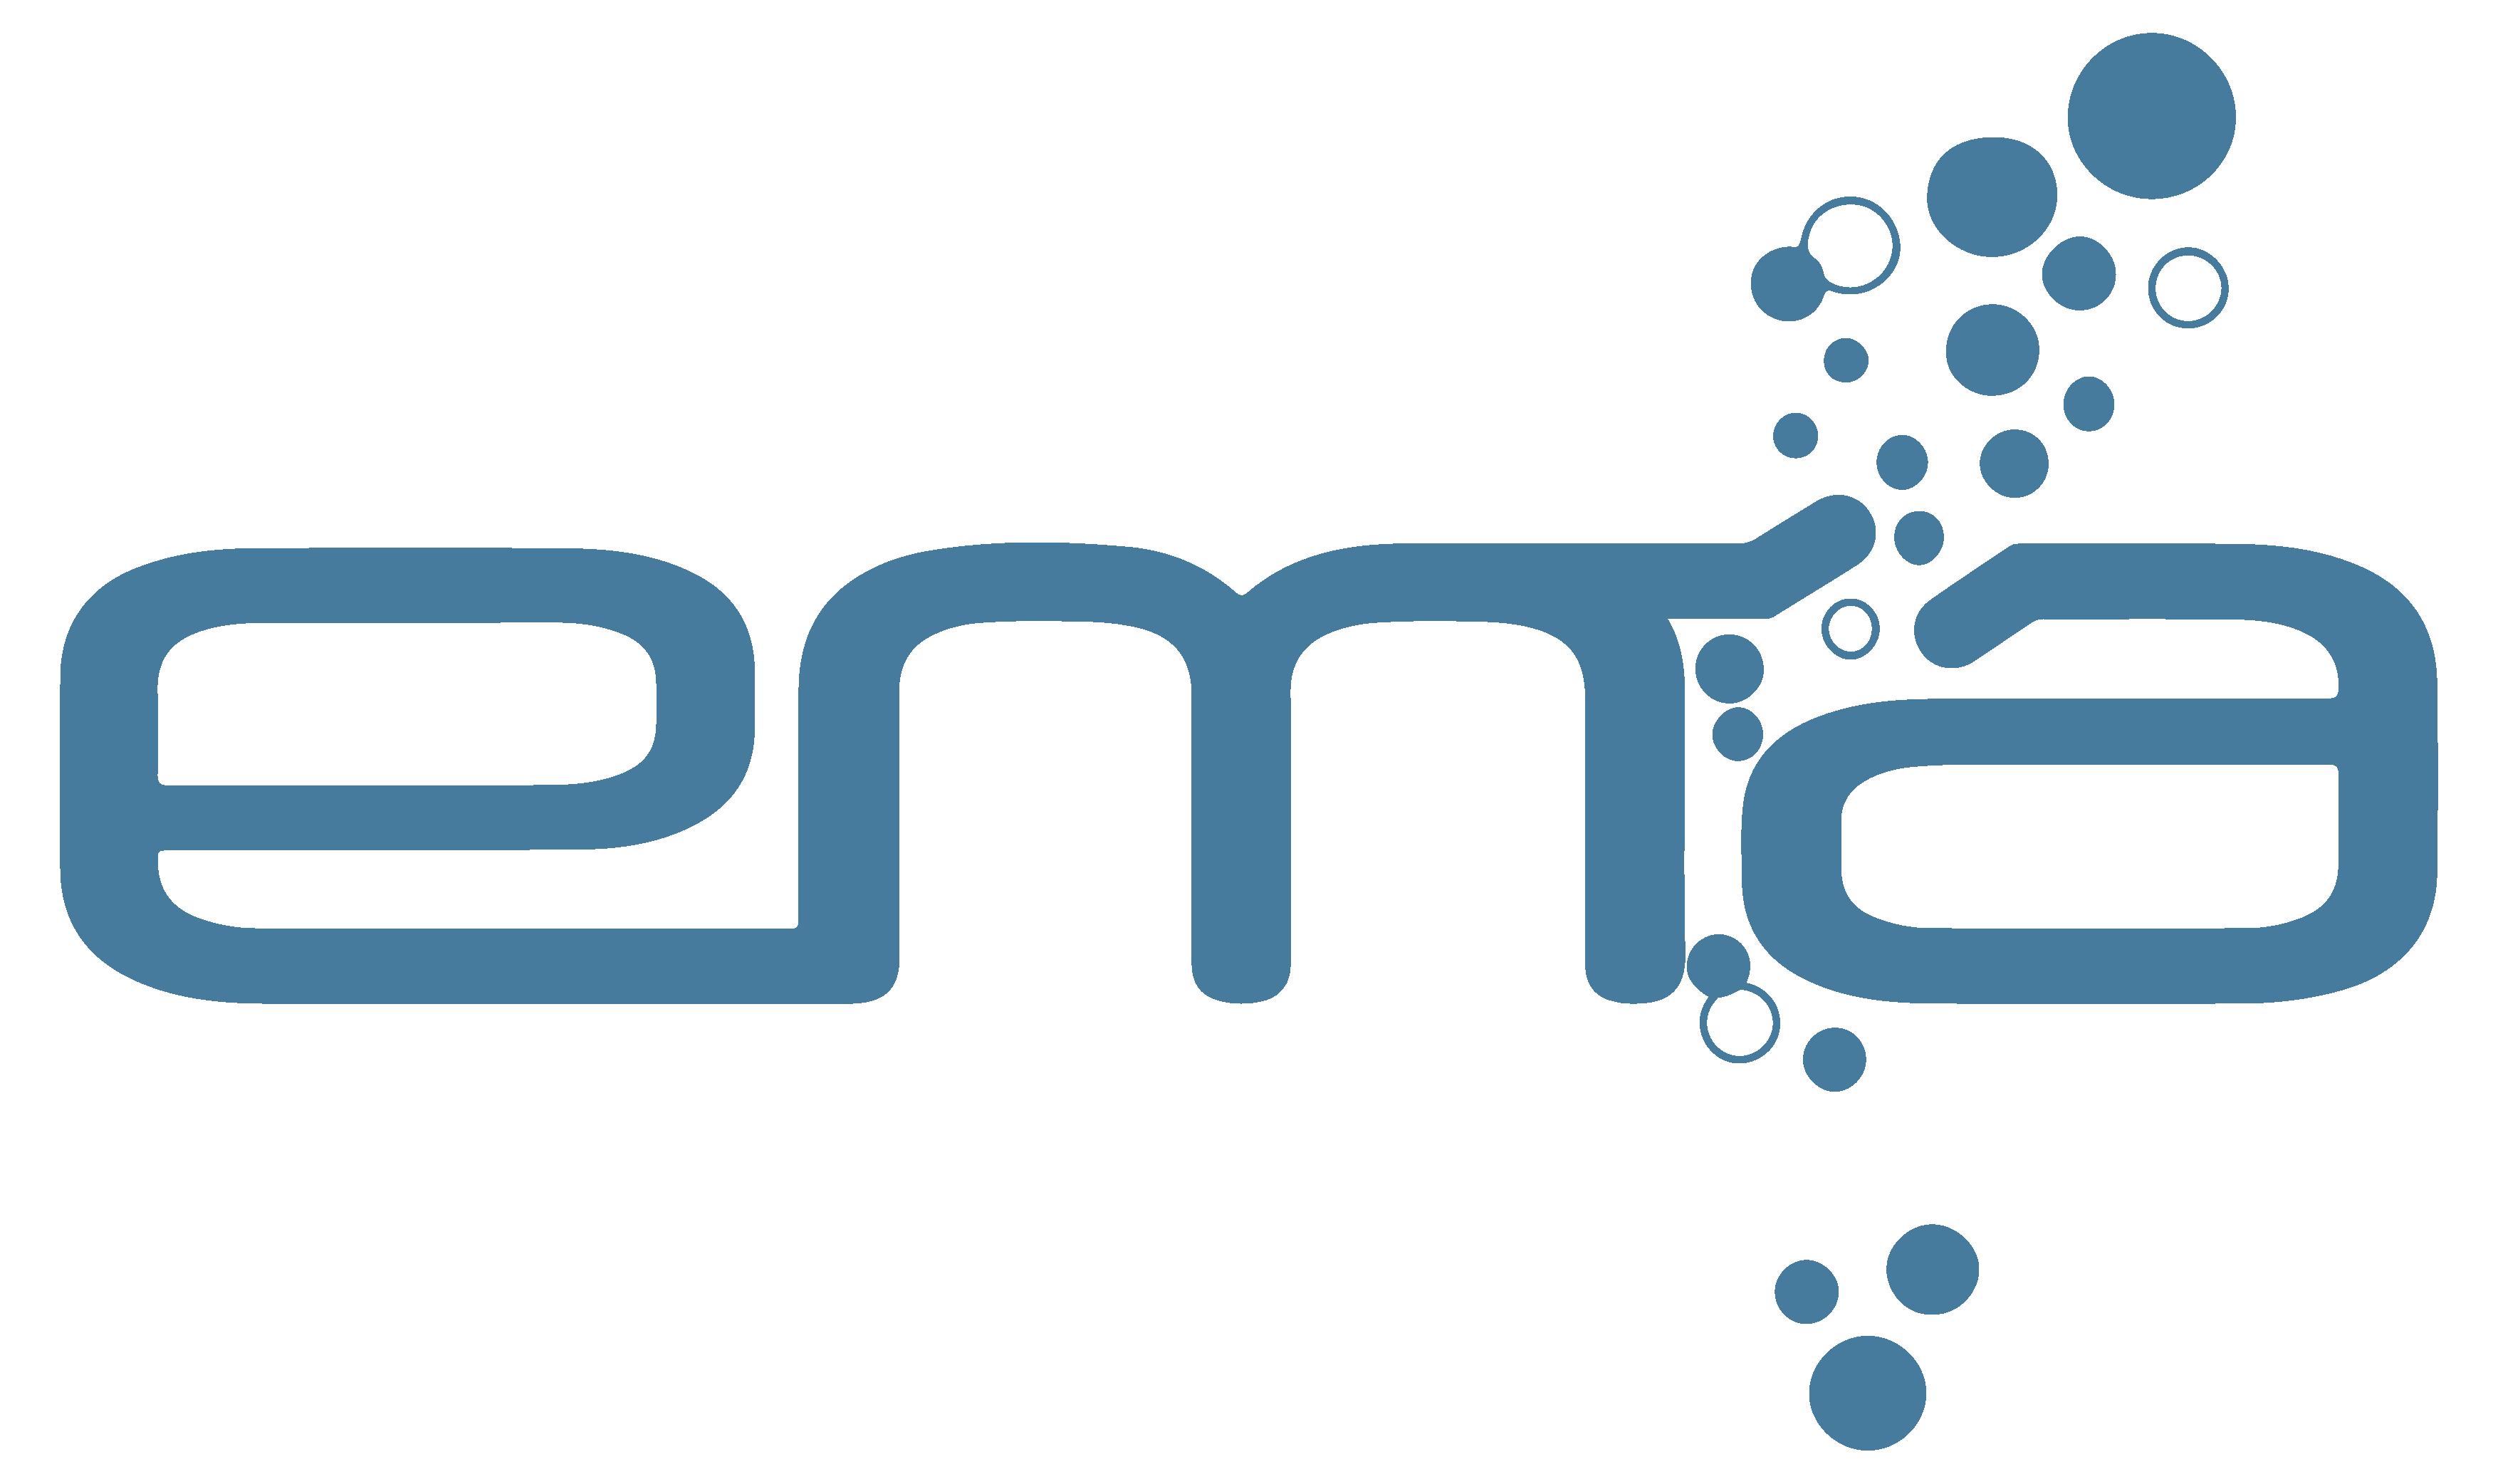 ERNST-MORITZ-ARNDT GYMNASIUM BONN